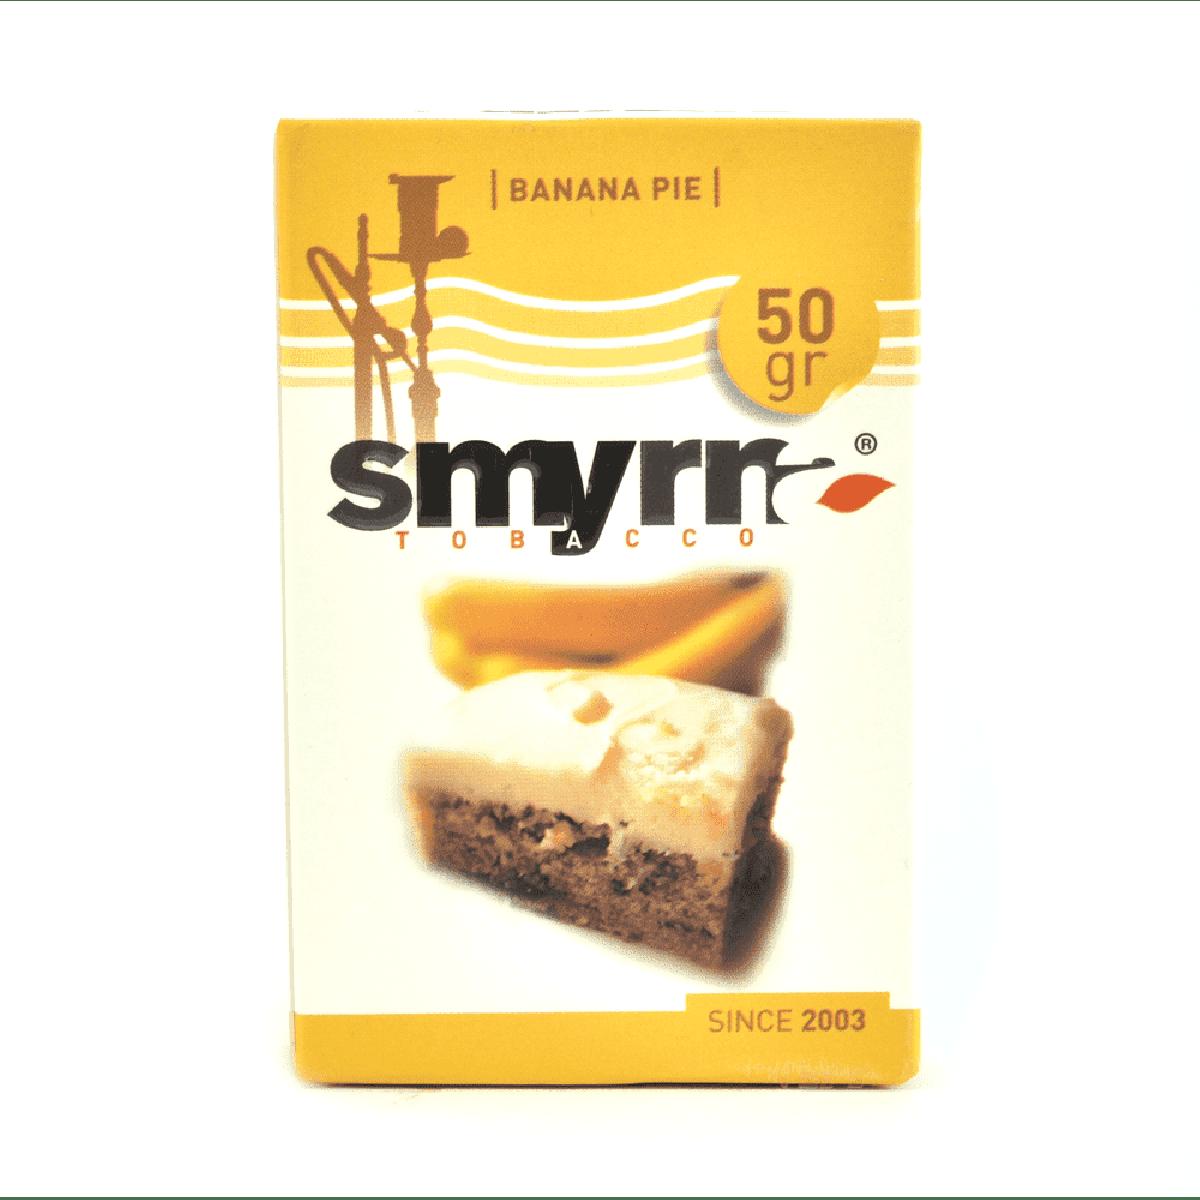 Табак Smyrna Banana Pie (Смирна Банановый пирог) 50 грамм